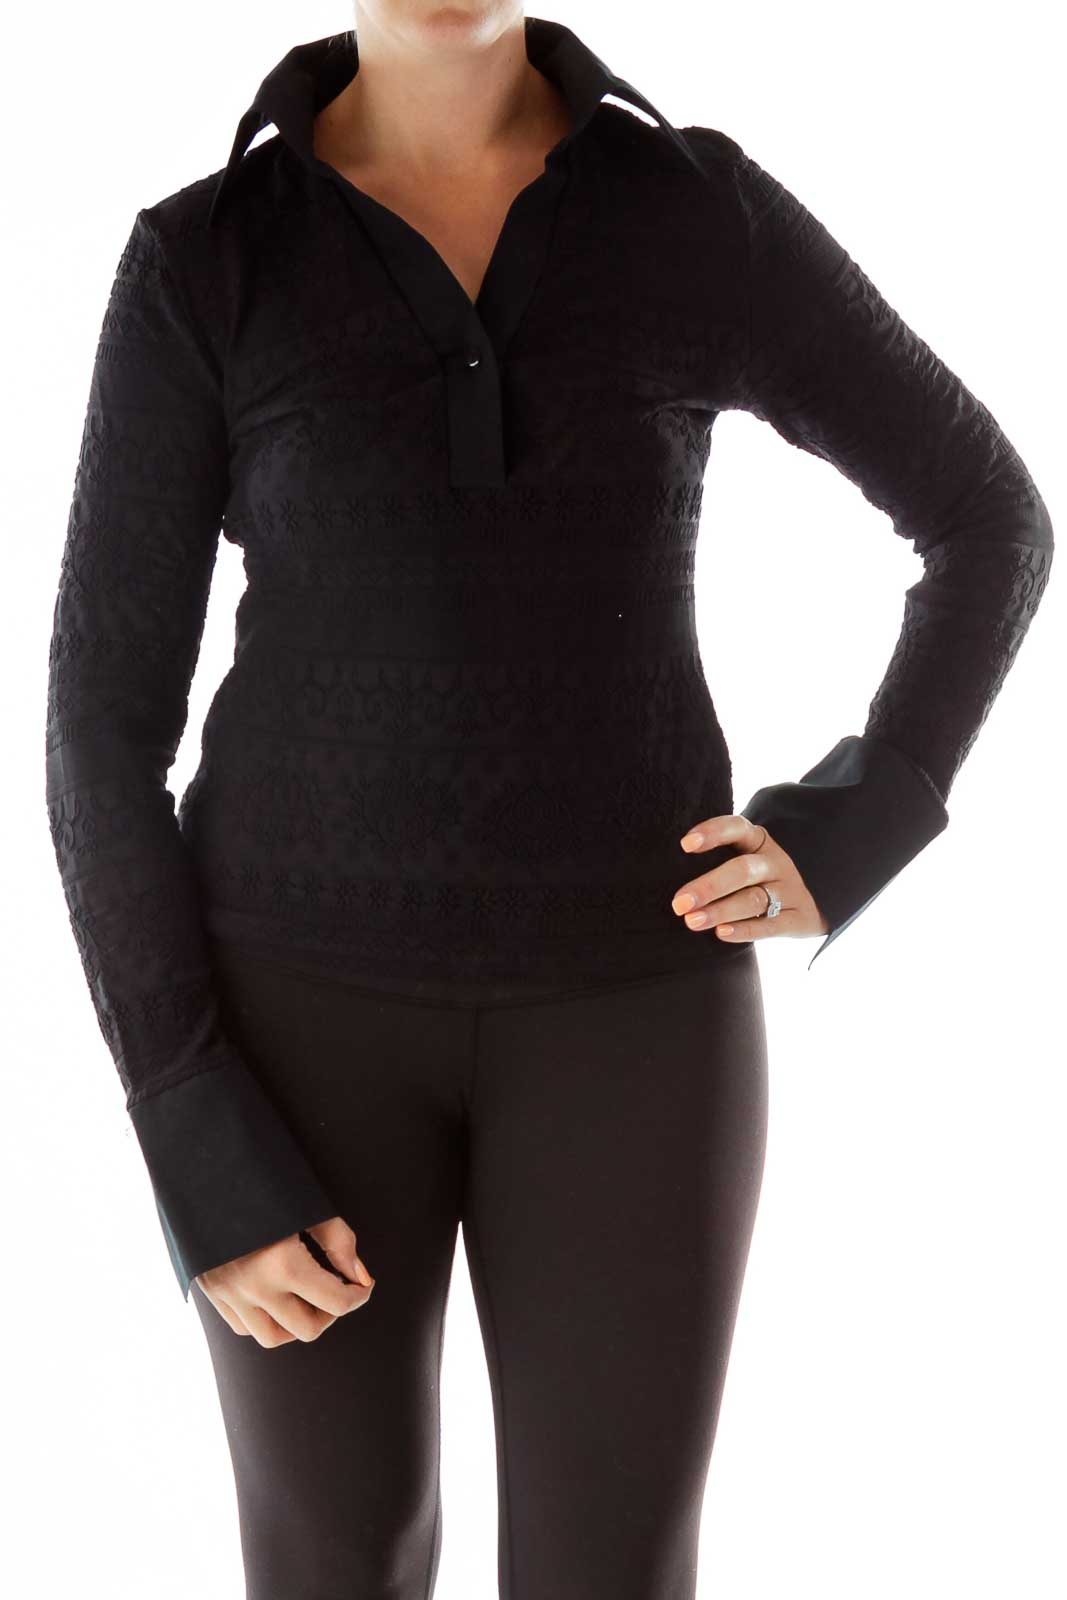 Black Embossed V-Neck Collared T-Shirt Front